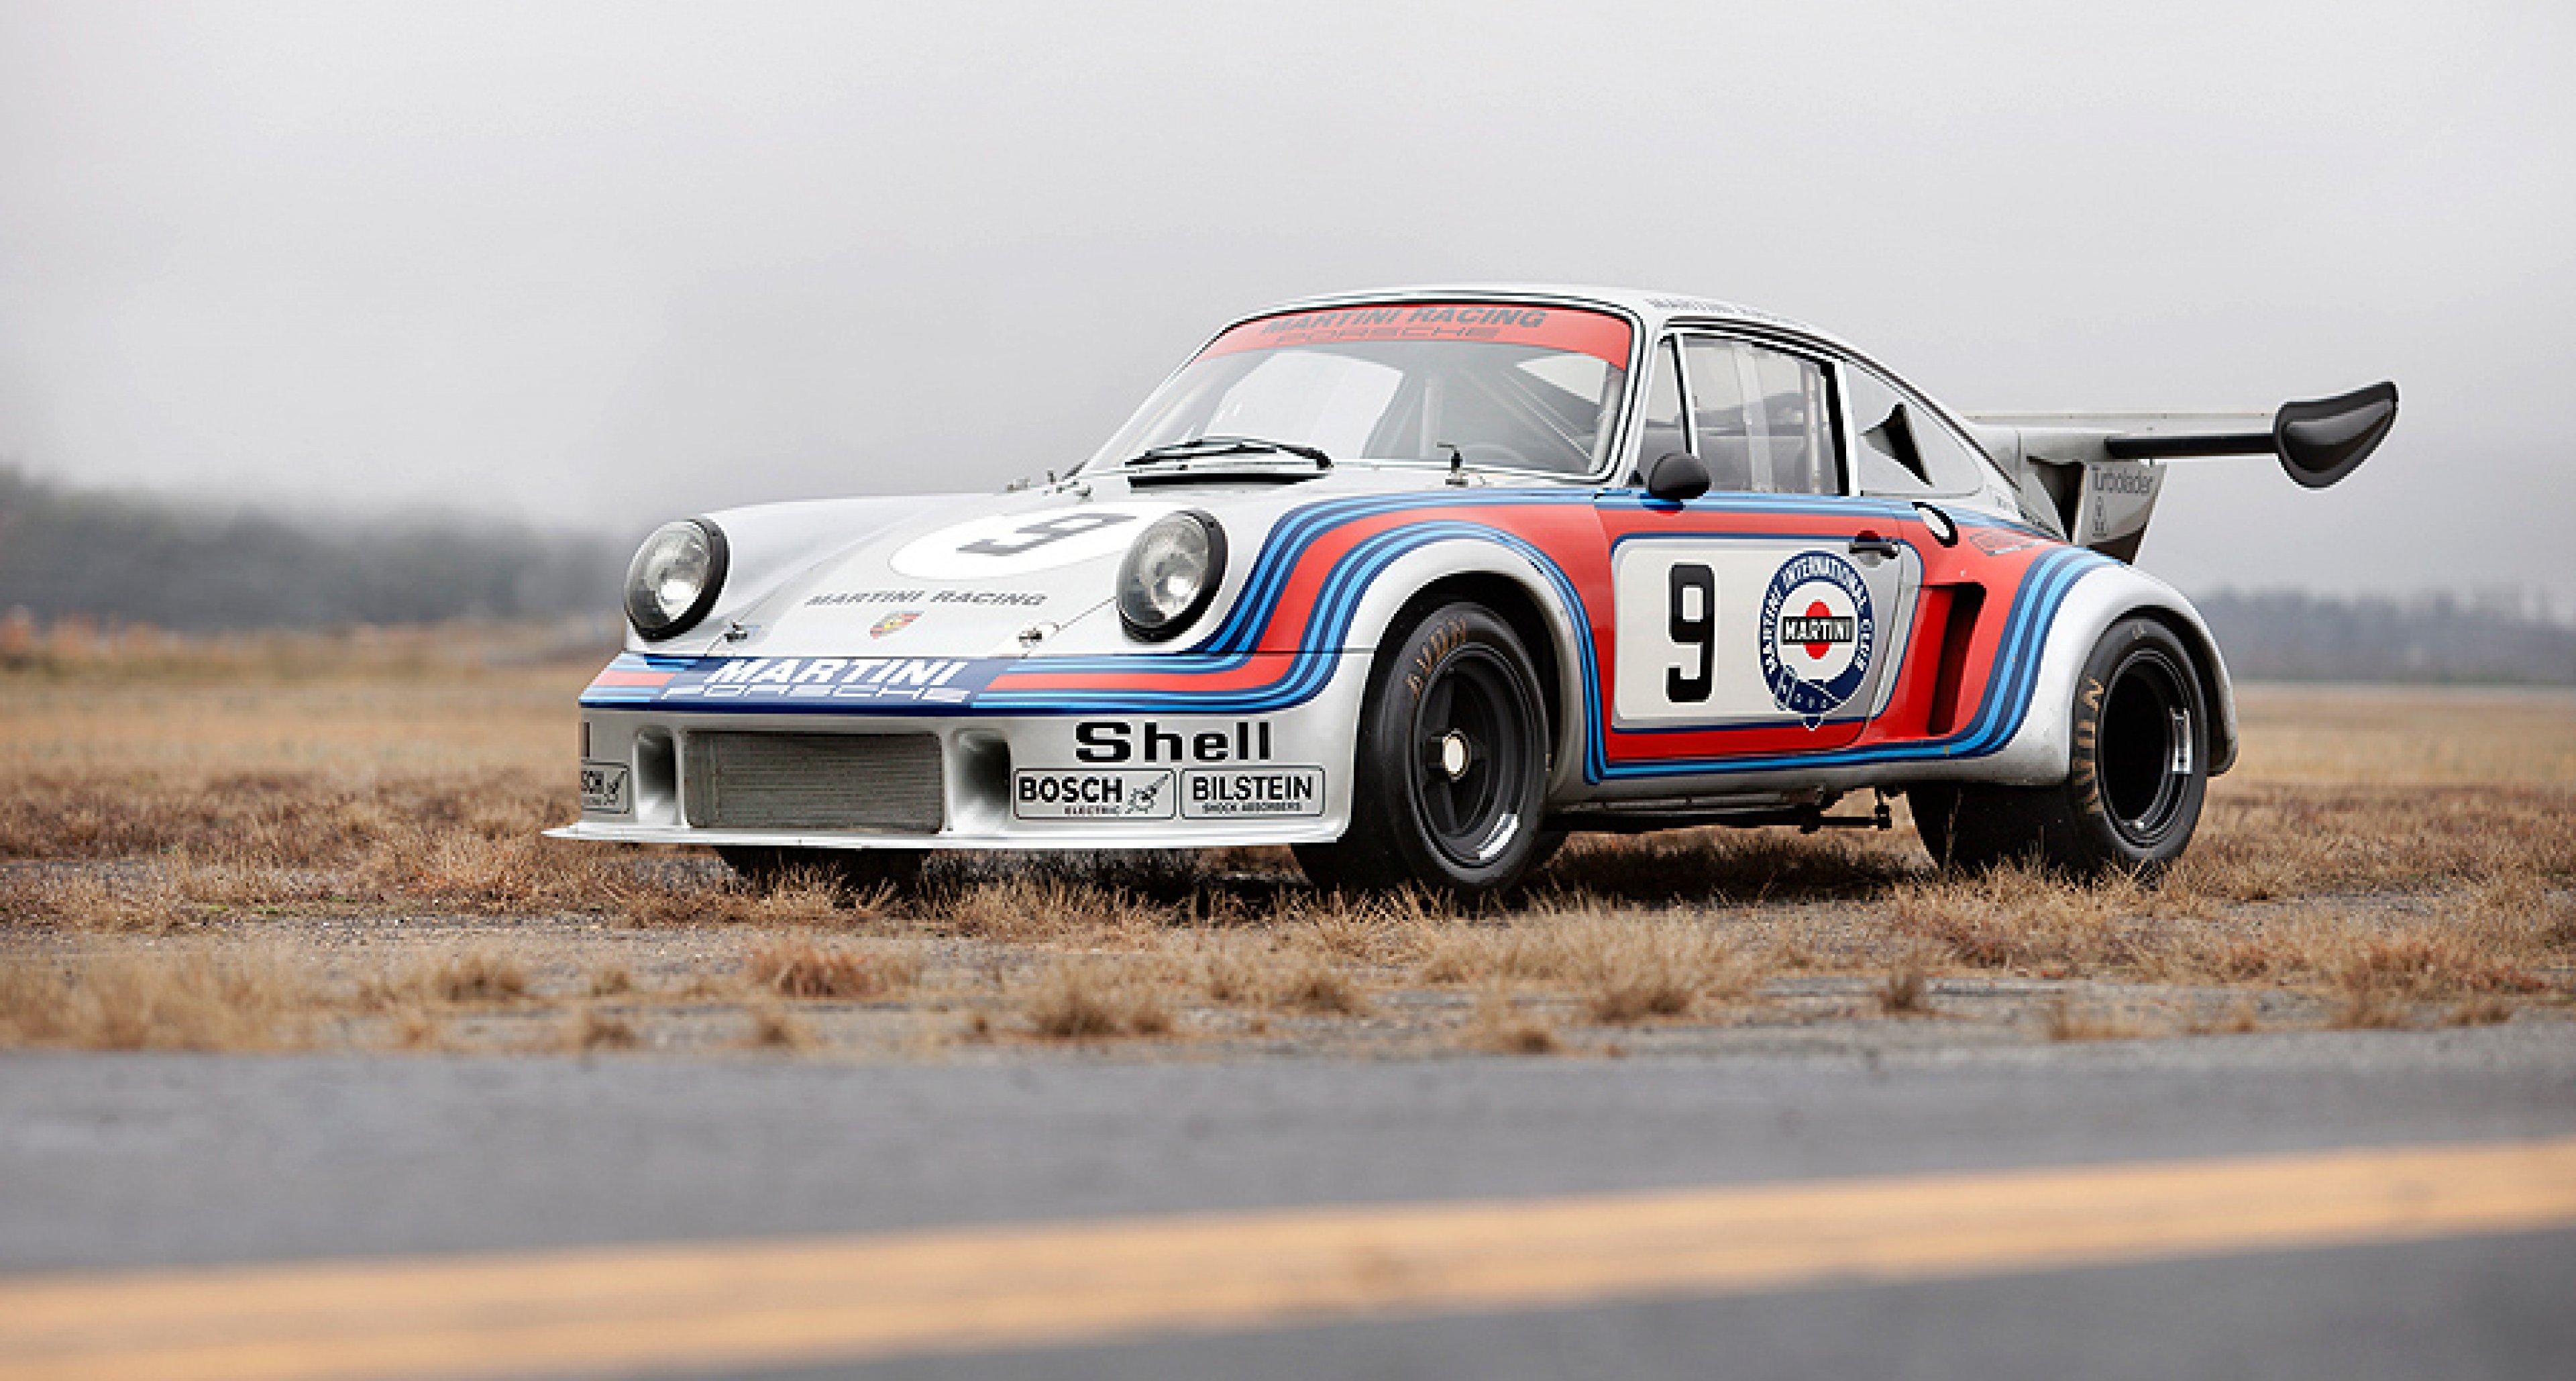 Gooding & Company versteigert seltenen Martini Porsche 911 RSR Turbo 2.14